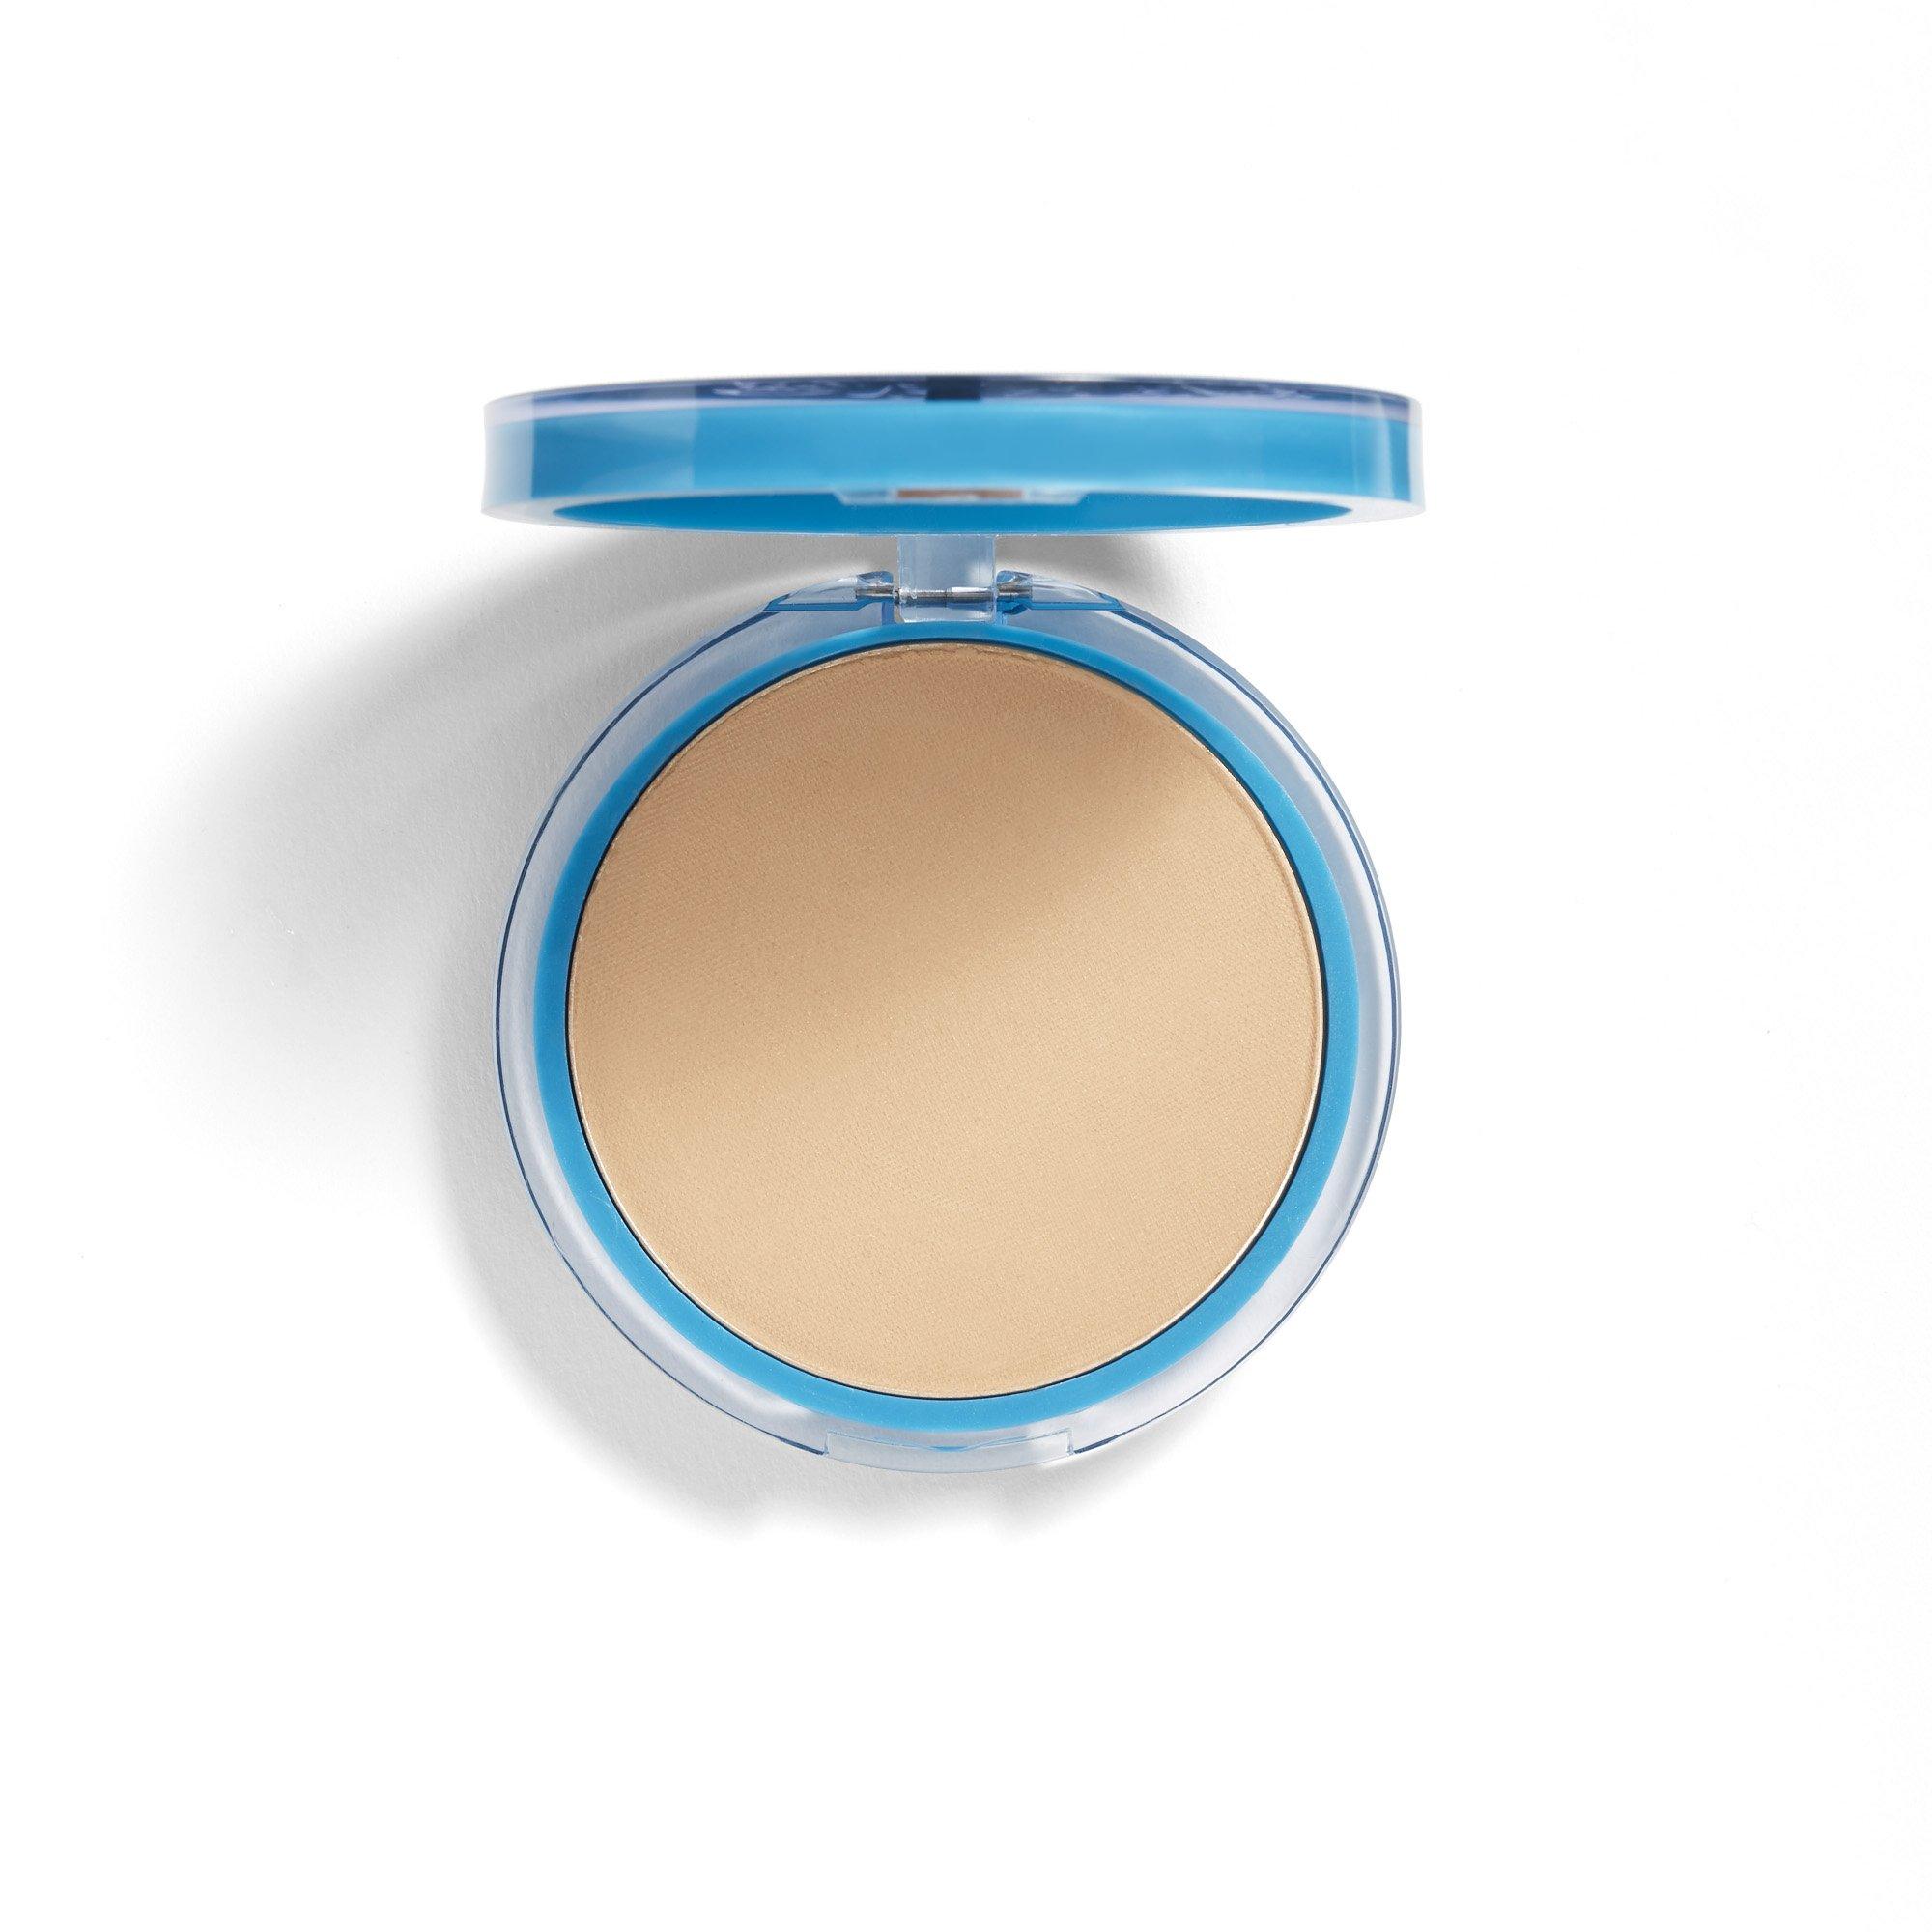 COVERGIRL Clean Matte Pressed Powder Medium Light 10 g (Packaging may vary)